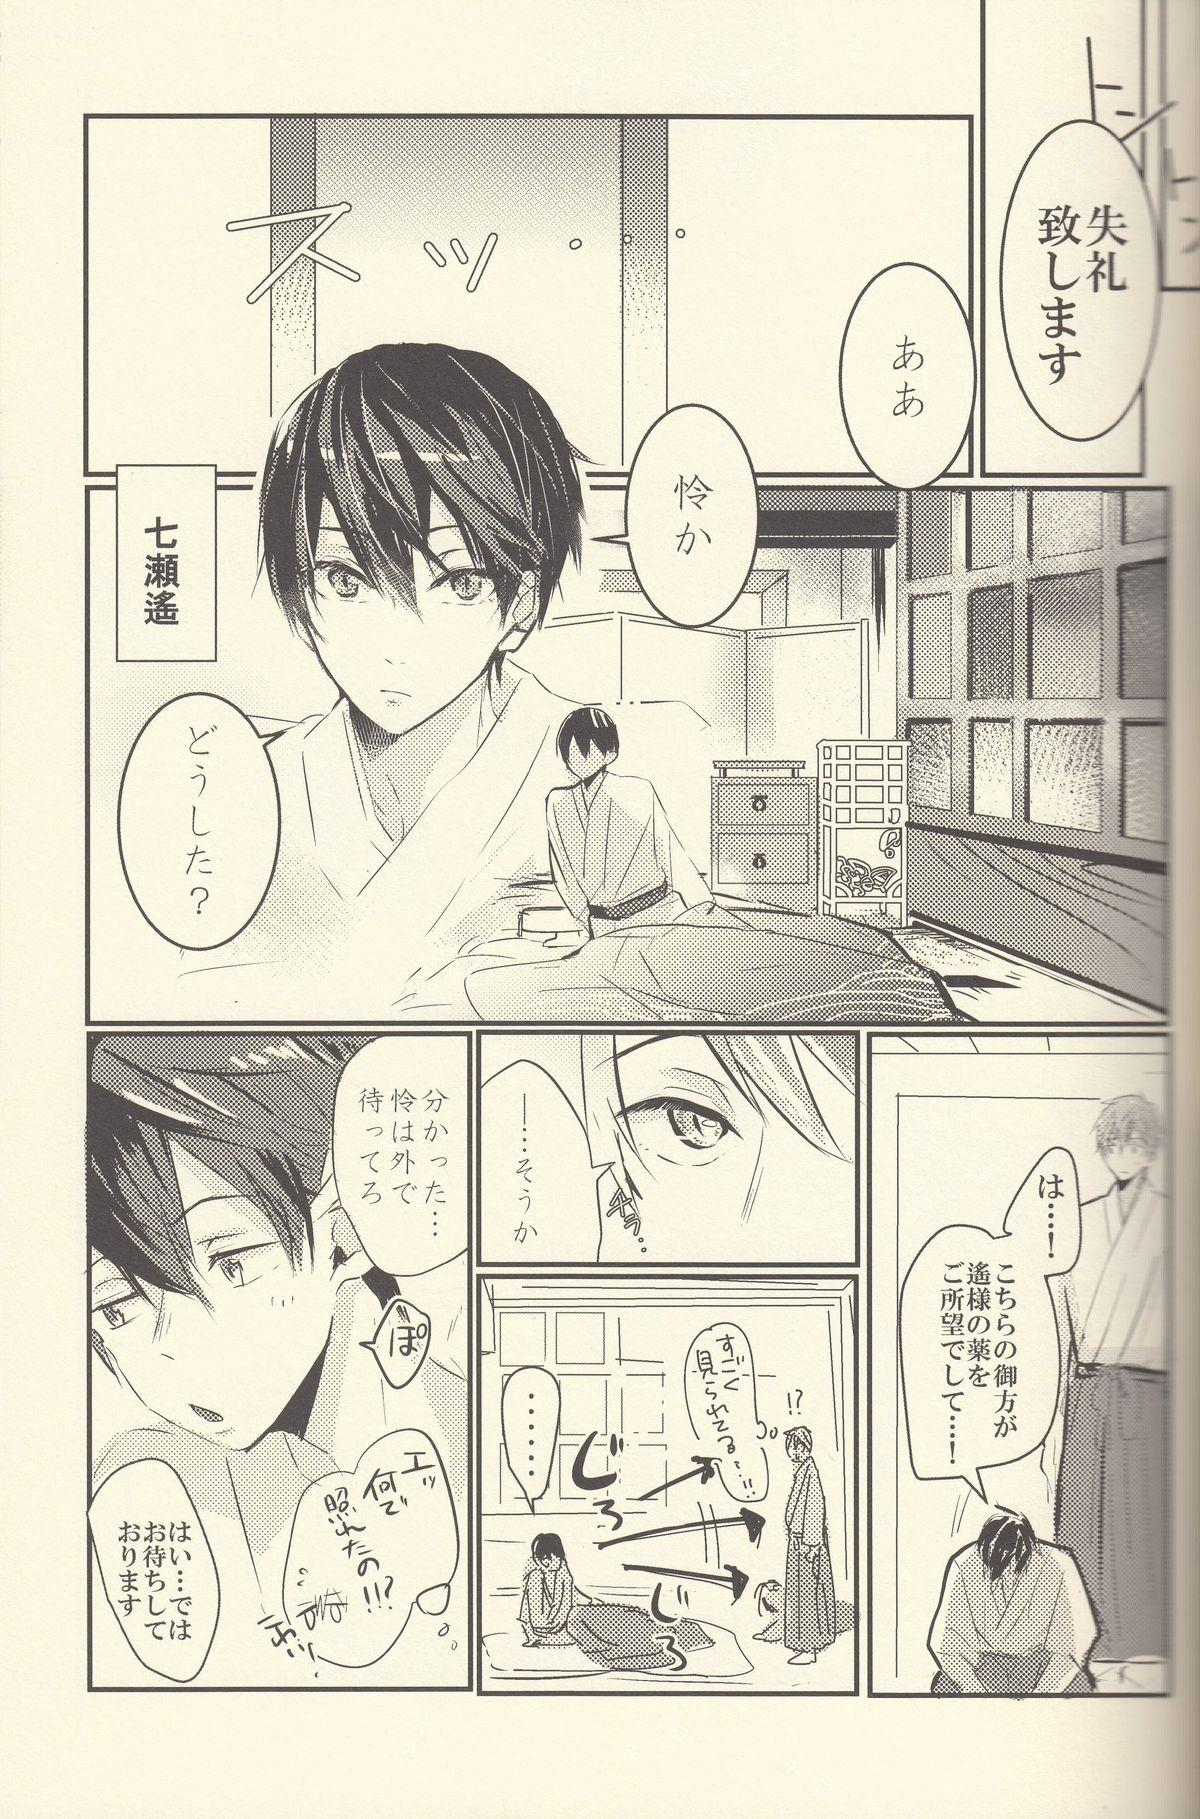 Shiofuki no Friendship - Makoto ♥ Haruka Squirting Anthology 18